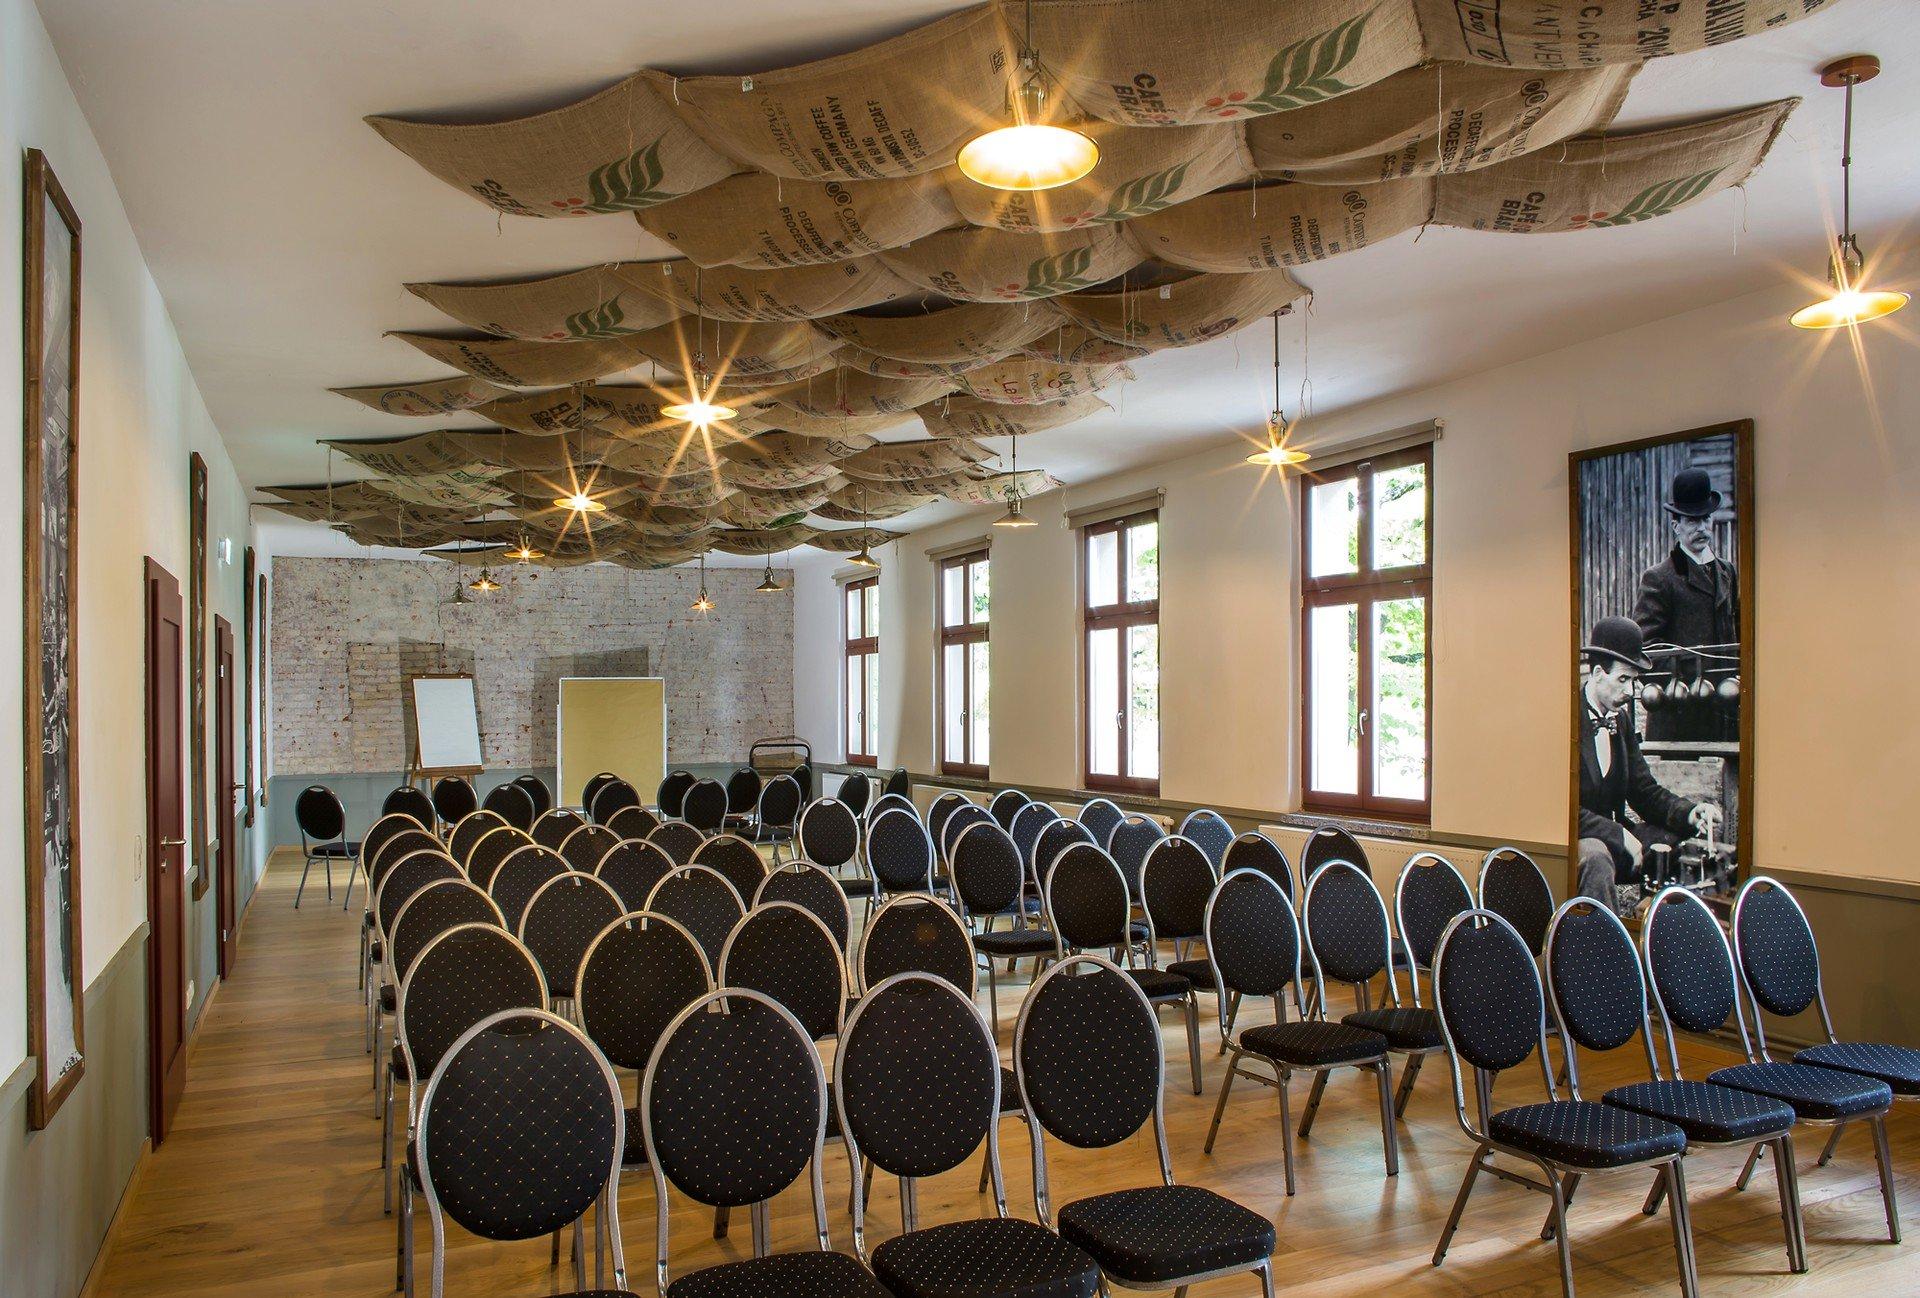 Berlin seminar rooms Meetingraum Alte Börse Marzahn - Malzlager image 2